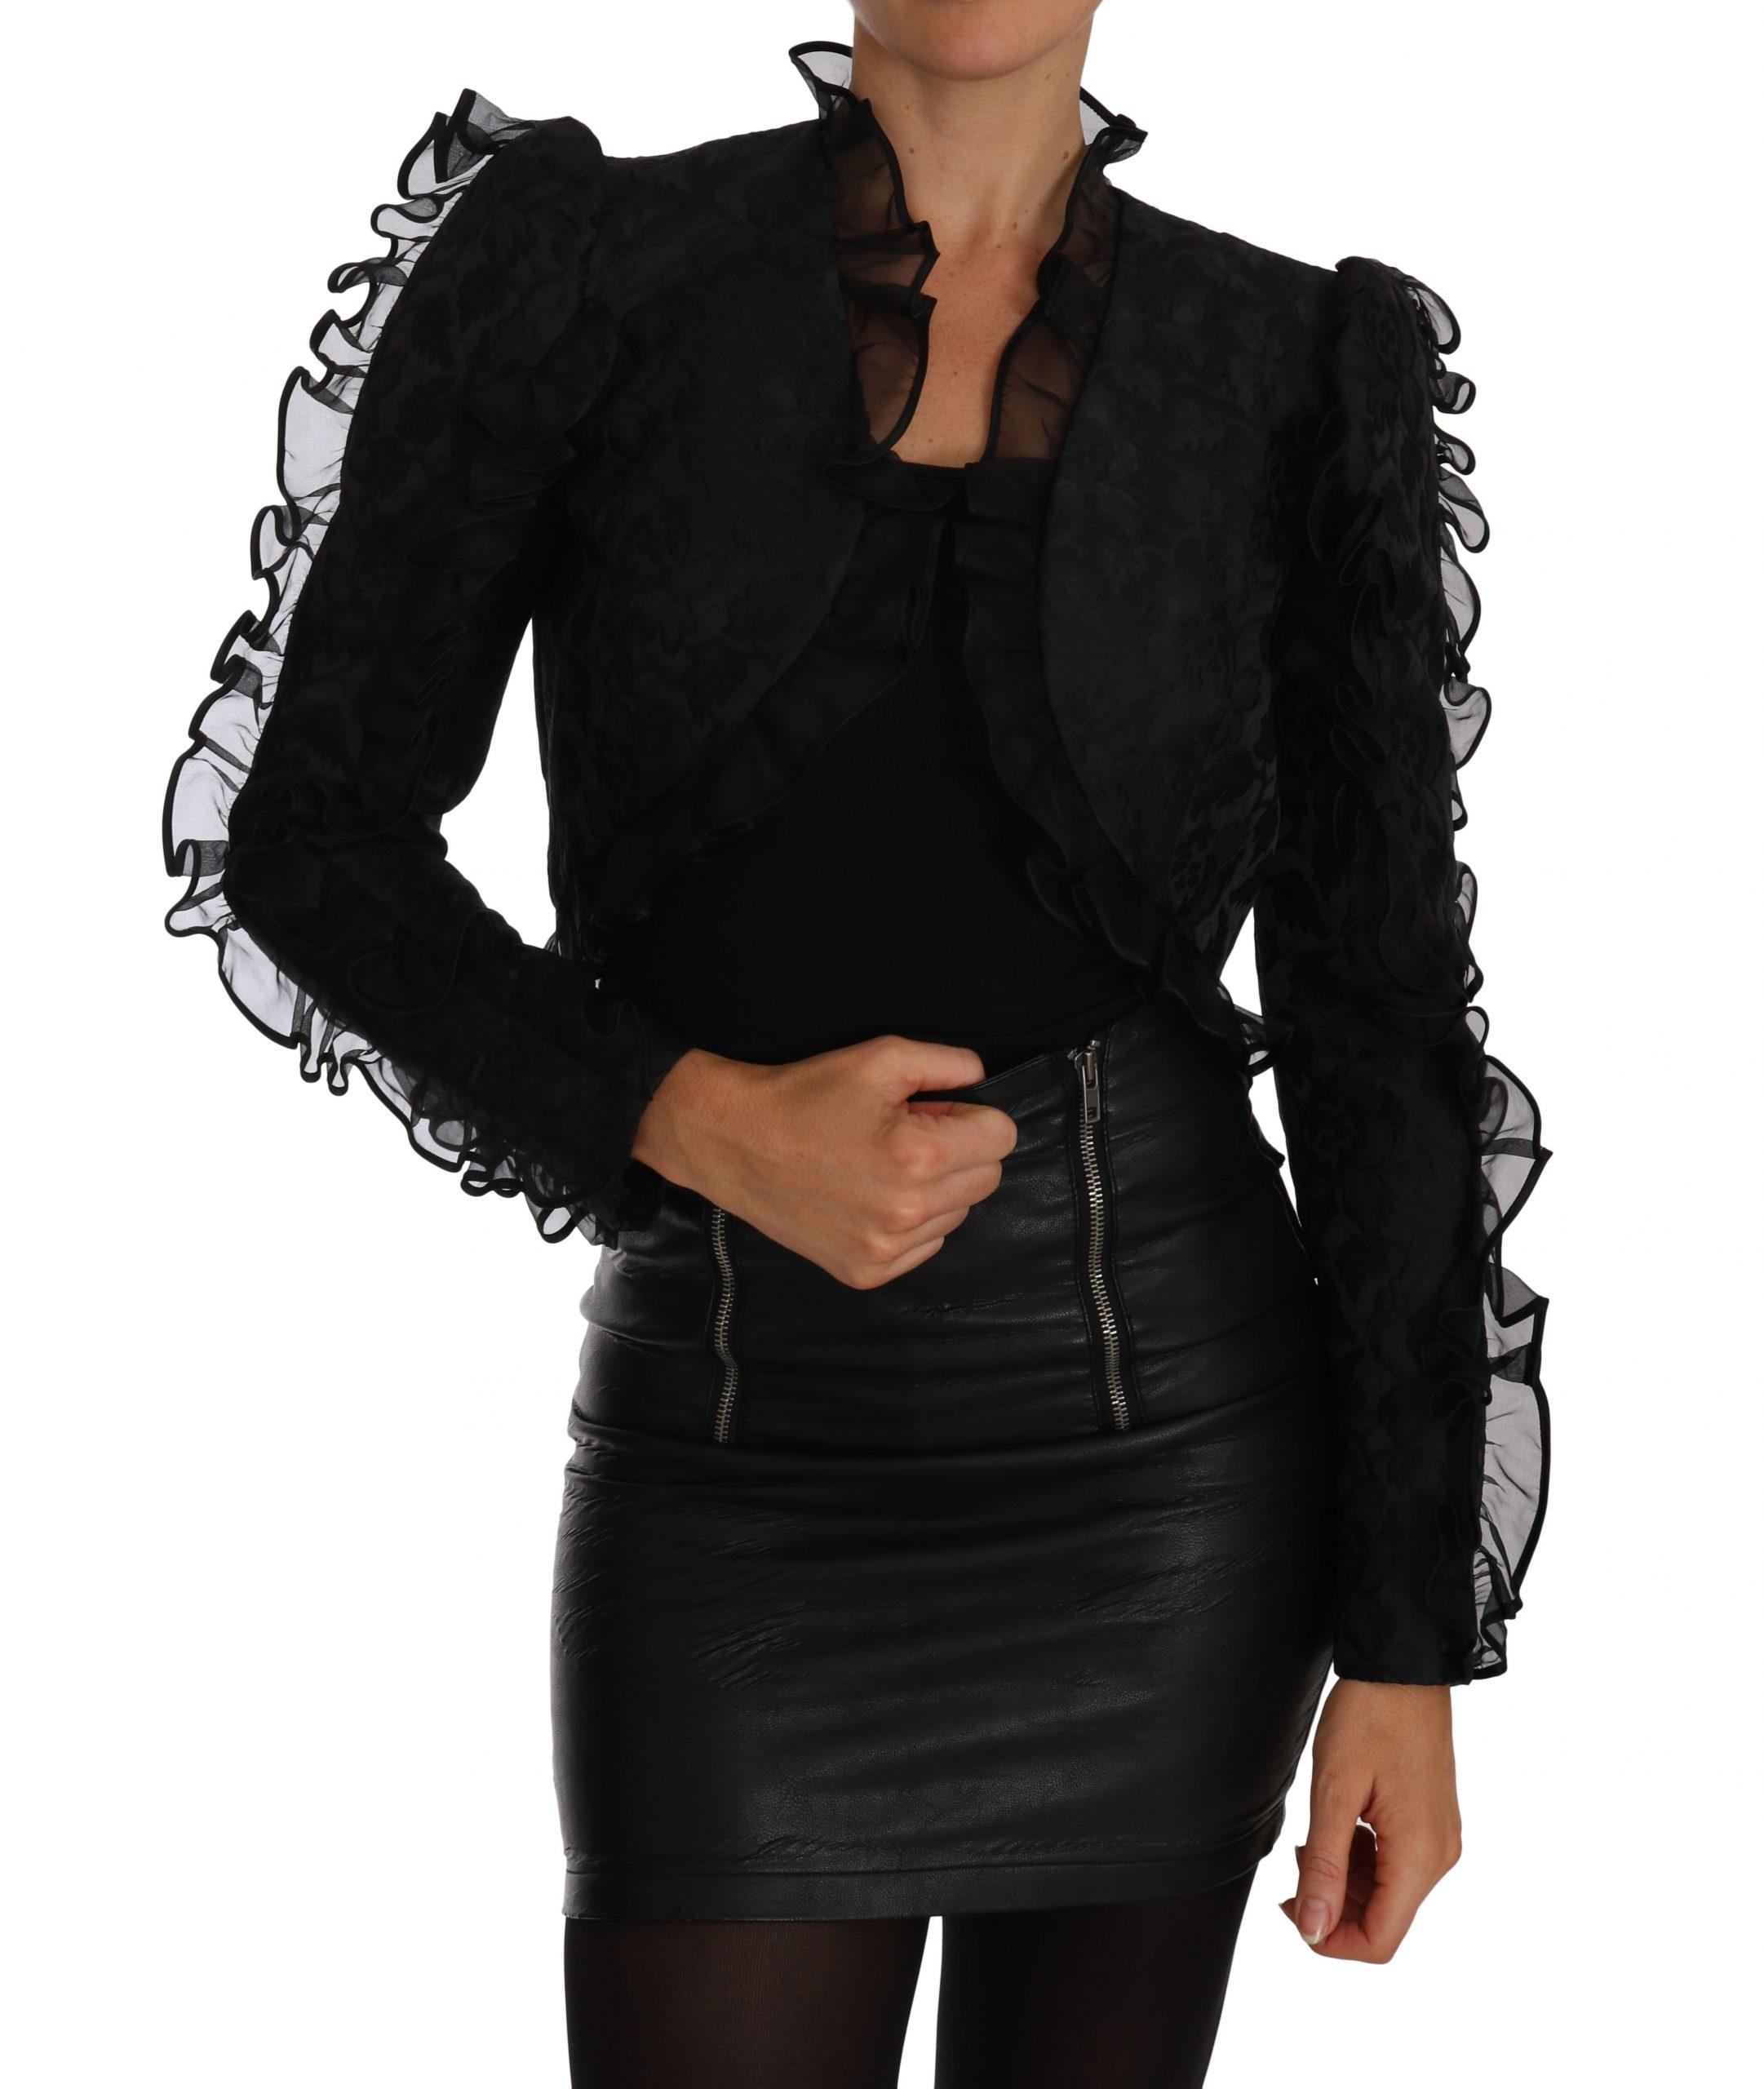 Dolce & Gabbana Women's Ruffled Crop Brocade Bolero Jacket Black TSH2306 - IT38|XS